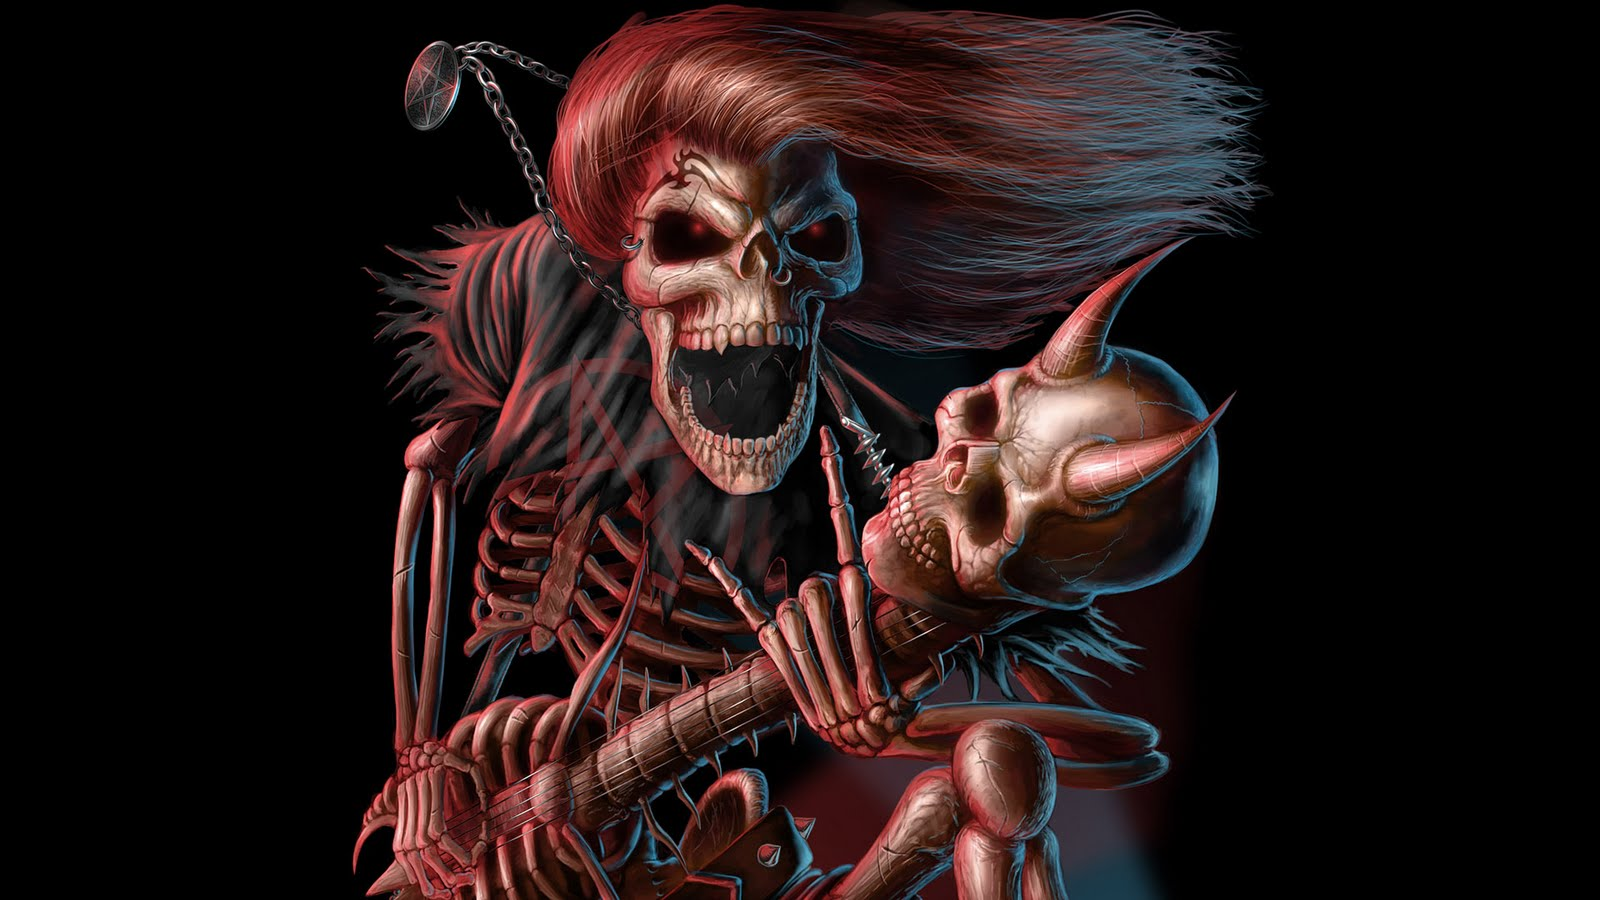 http://3.bp.blogspot.com/-Jim9F64ZwEI/UI8ErIryydI/AAAAAAAAE-s/1Ys6PBy352s/s1600/caveira-guitarrista-death-metal.jpg